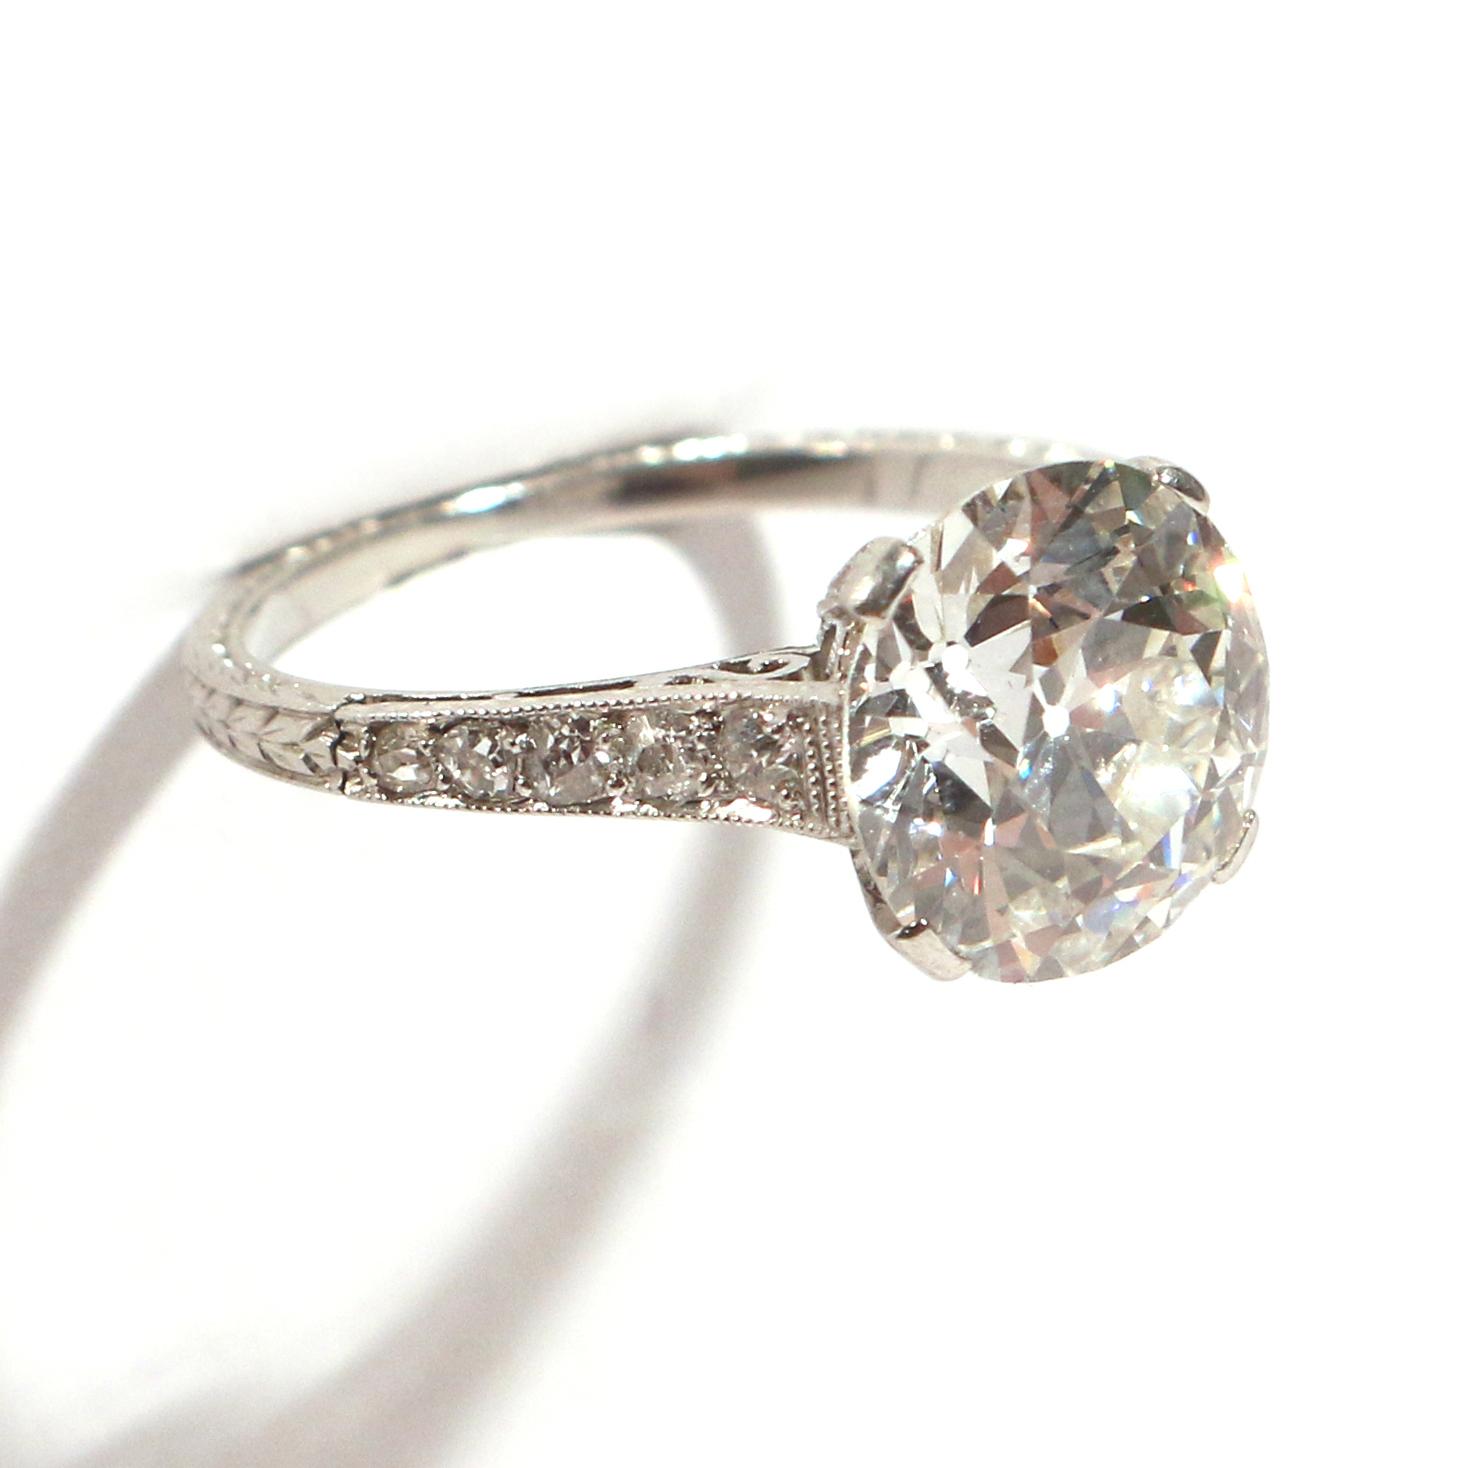 Lot 92 - 3.44ct OLD MINE CUT DIAMOND